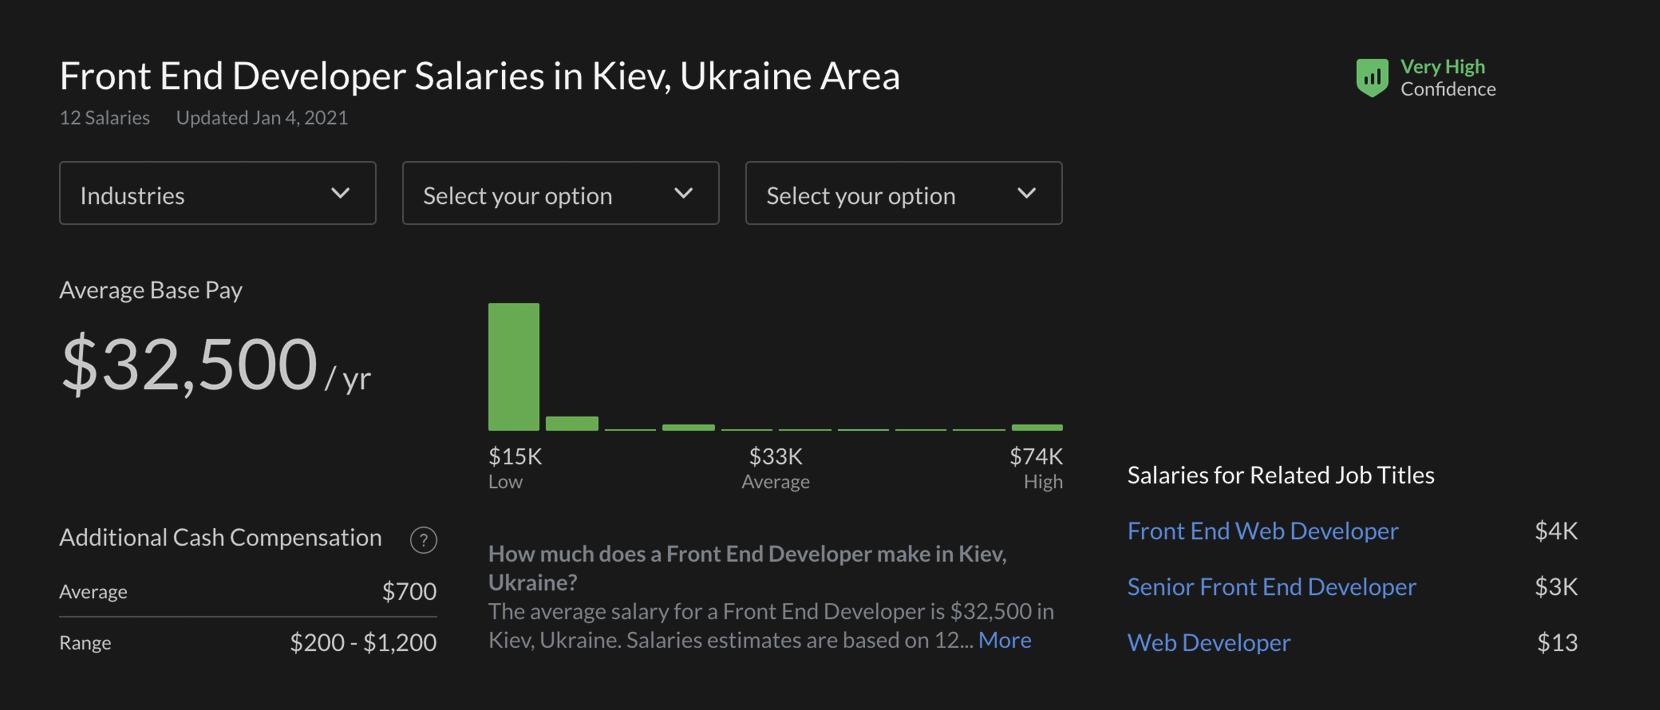 Ukrainian salary for front end devs